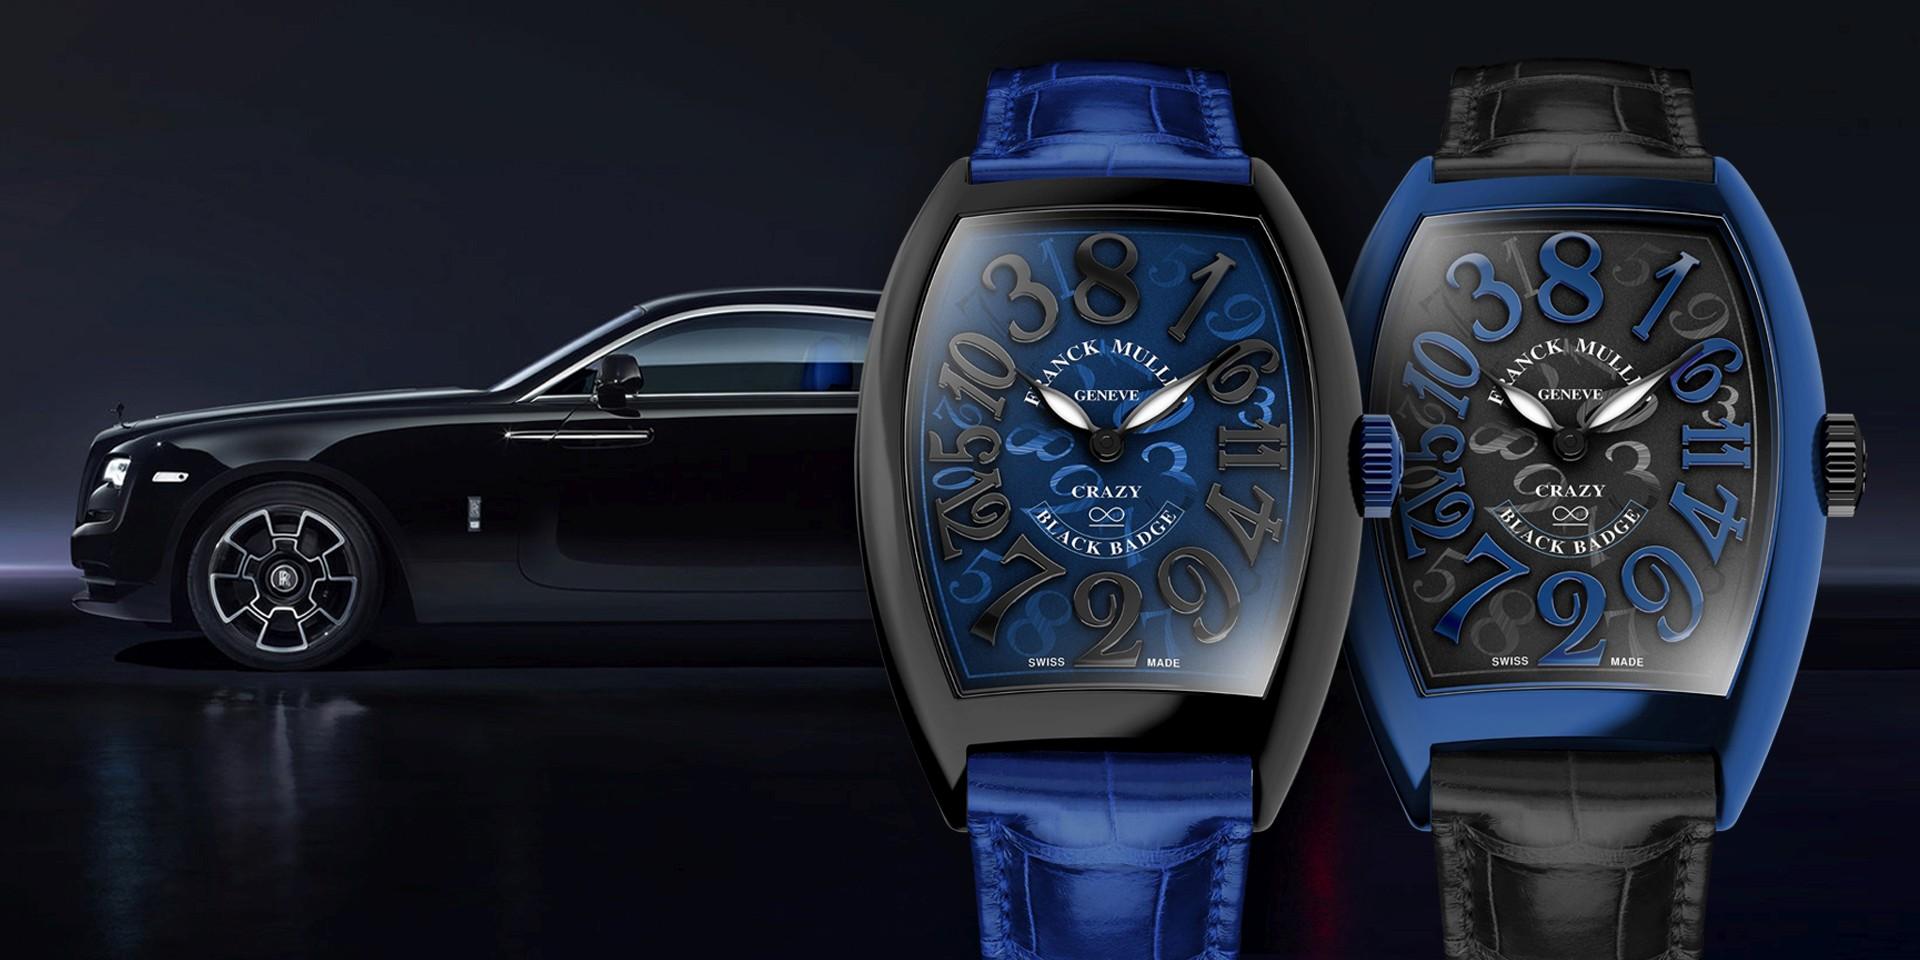 Franck Muller與日內瓦勞斯萊斯汽車聯手催生Crazy Hours Wraith Black Badge特別版腕錶與魅影Wraith Crazy Numbers